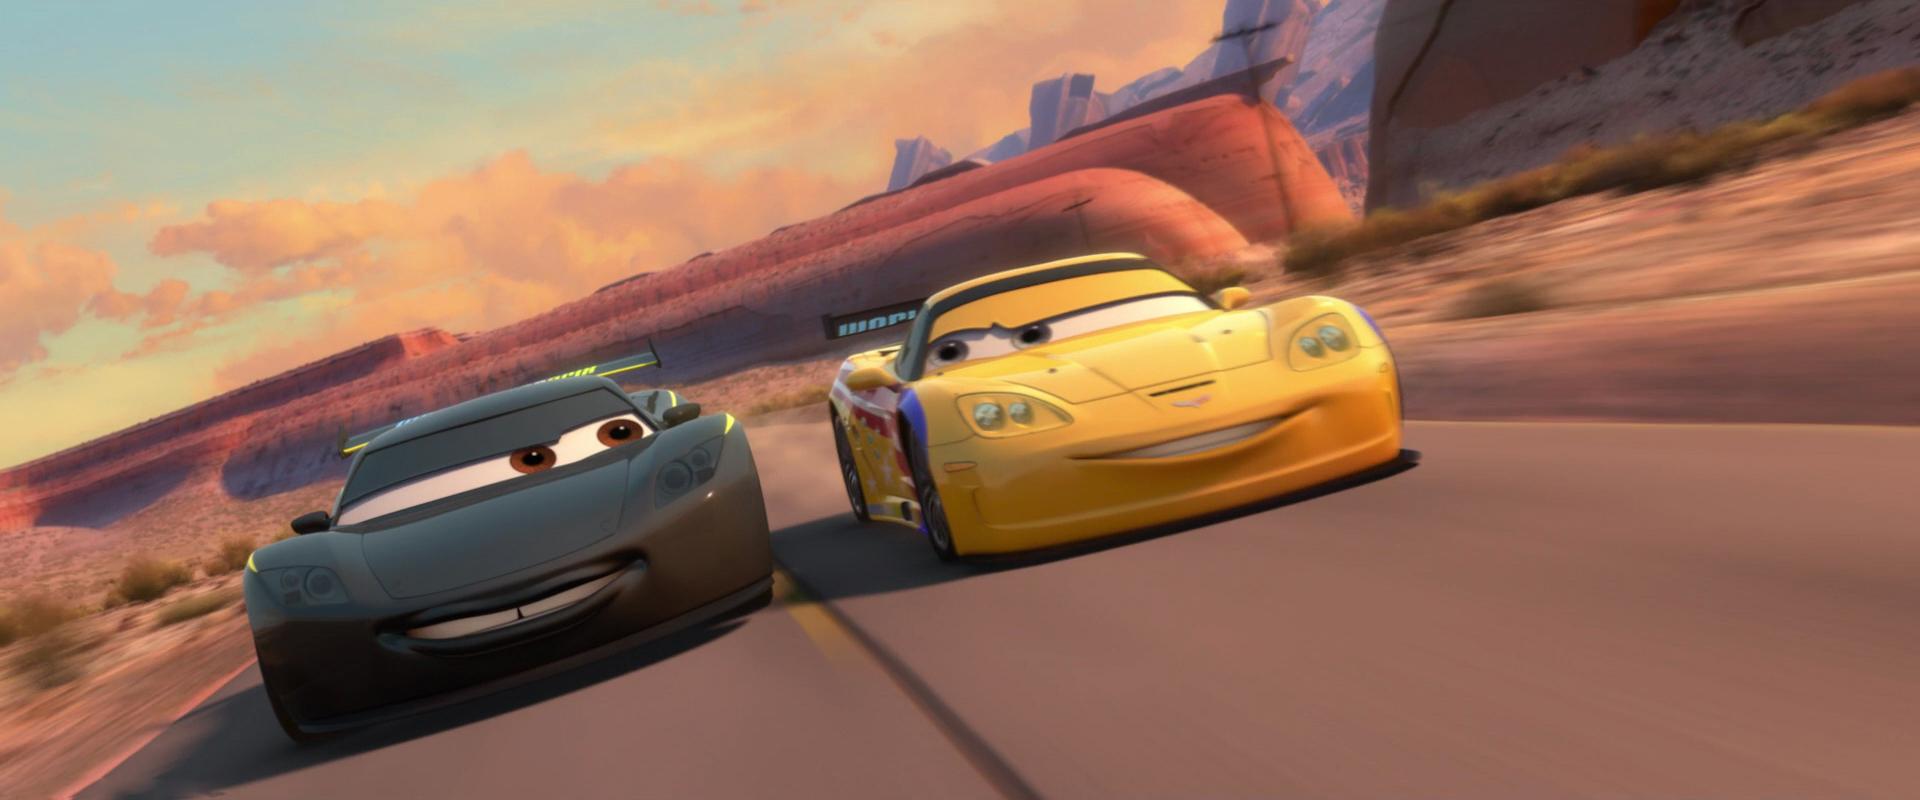 MOVIE: Cars 2 - meet Jeff Gorvette and Darrel Cartrip